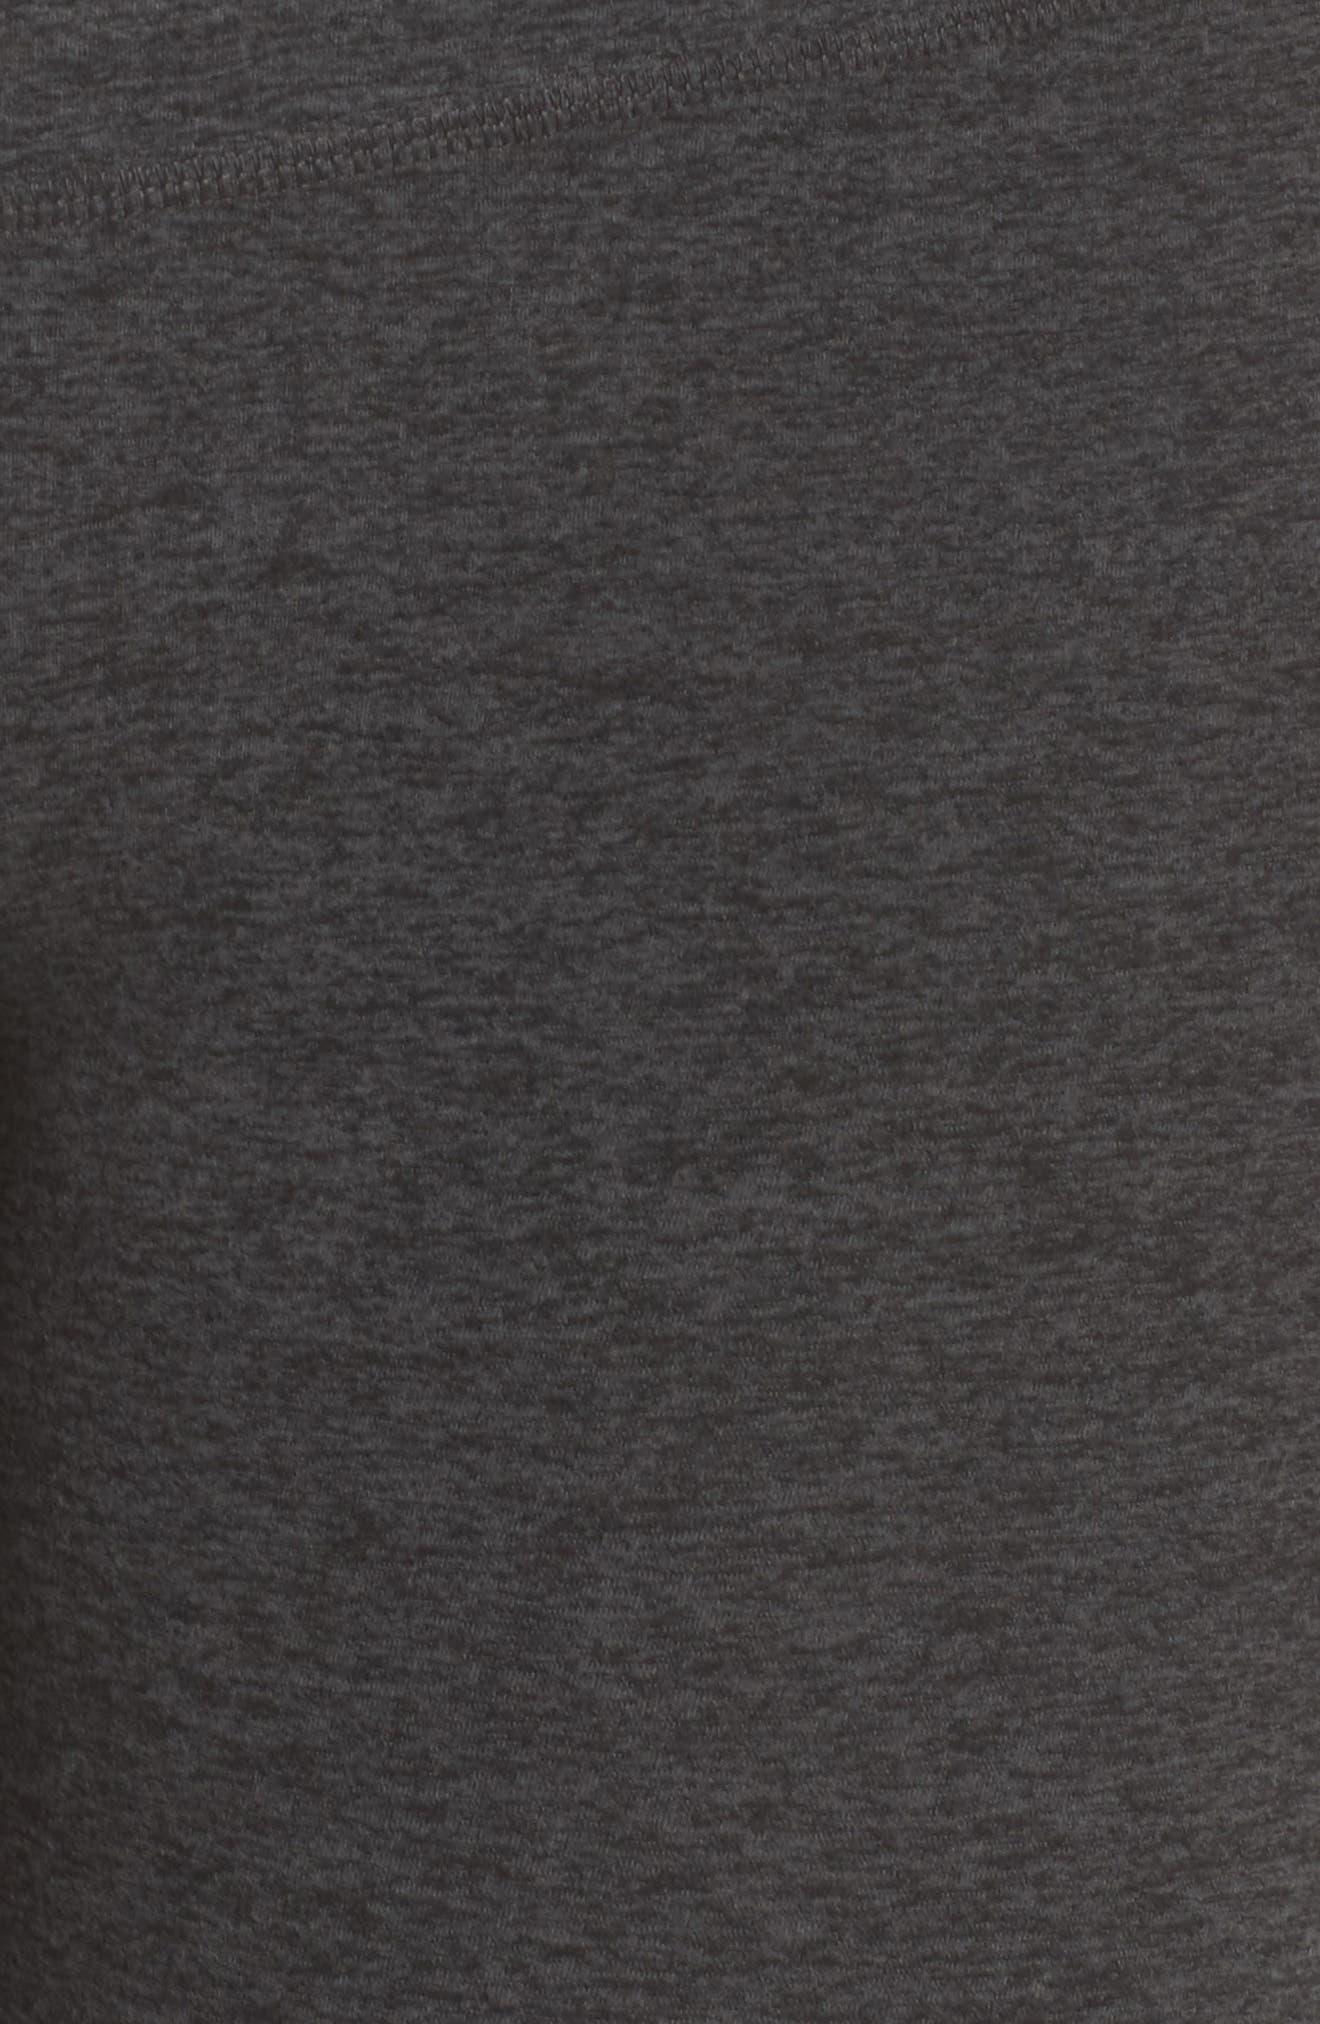 High Waist Midi Leggings,                             Alternate thumbnail 6, color,                             BLACK/ CHARCOAL